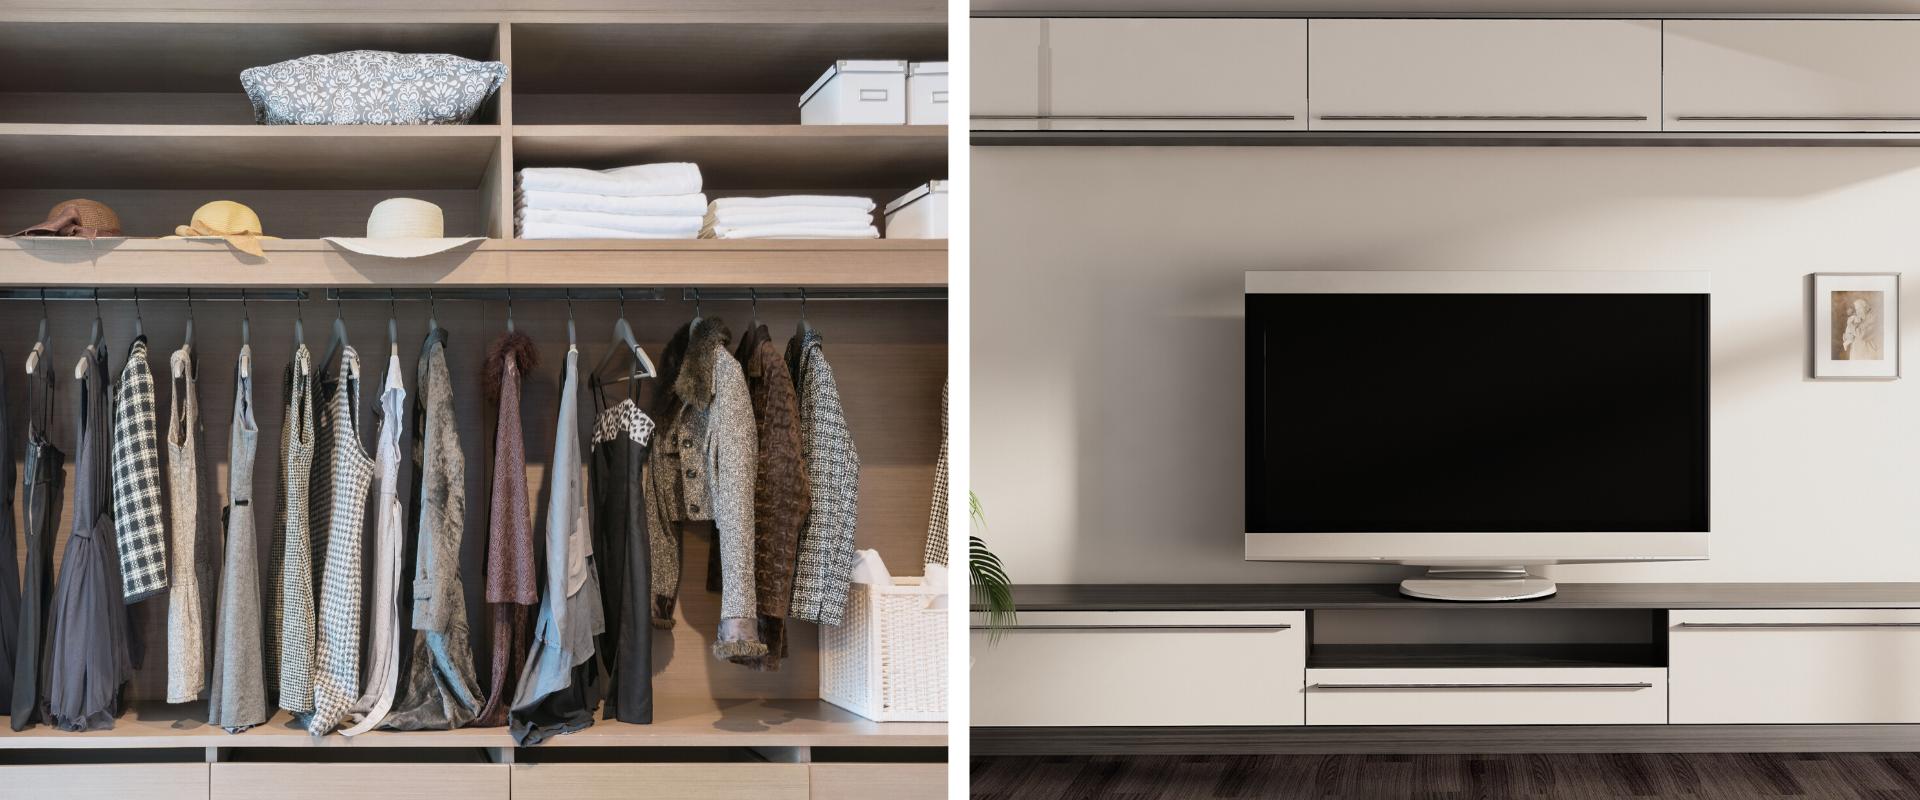 Design Custom Cabinetry for Interior Spaces